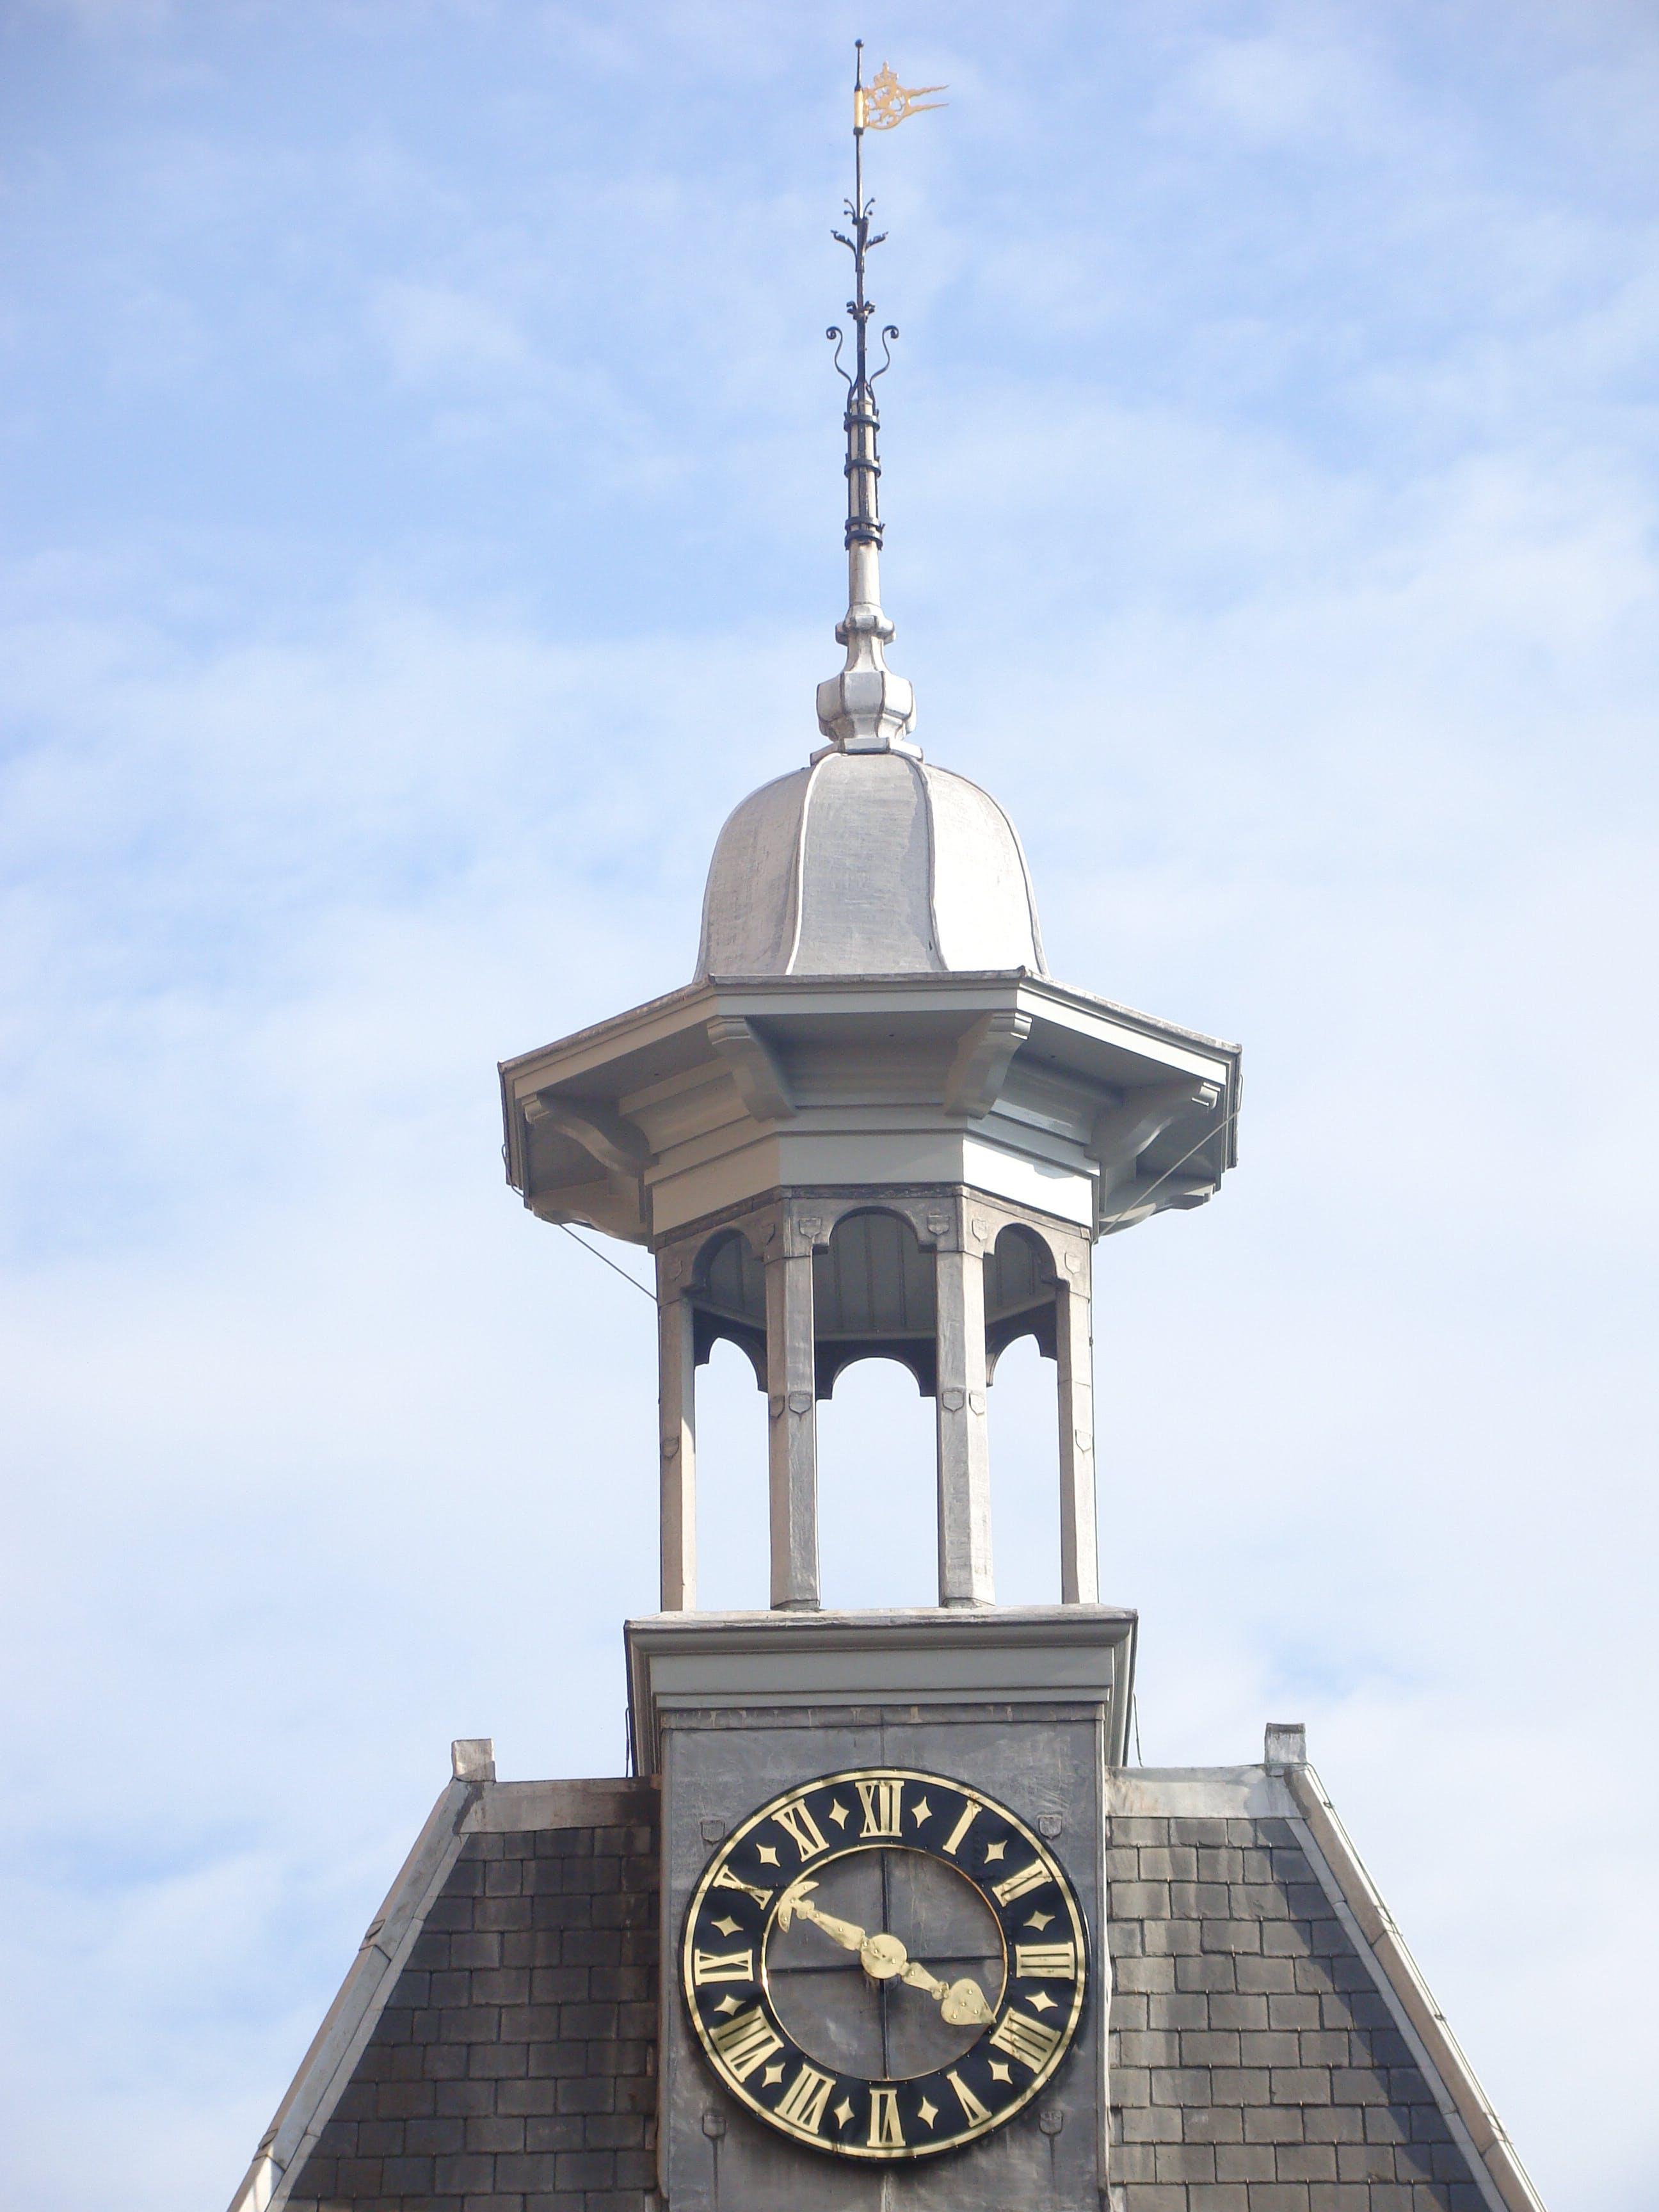 Free stock photo of clock